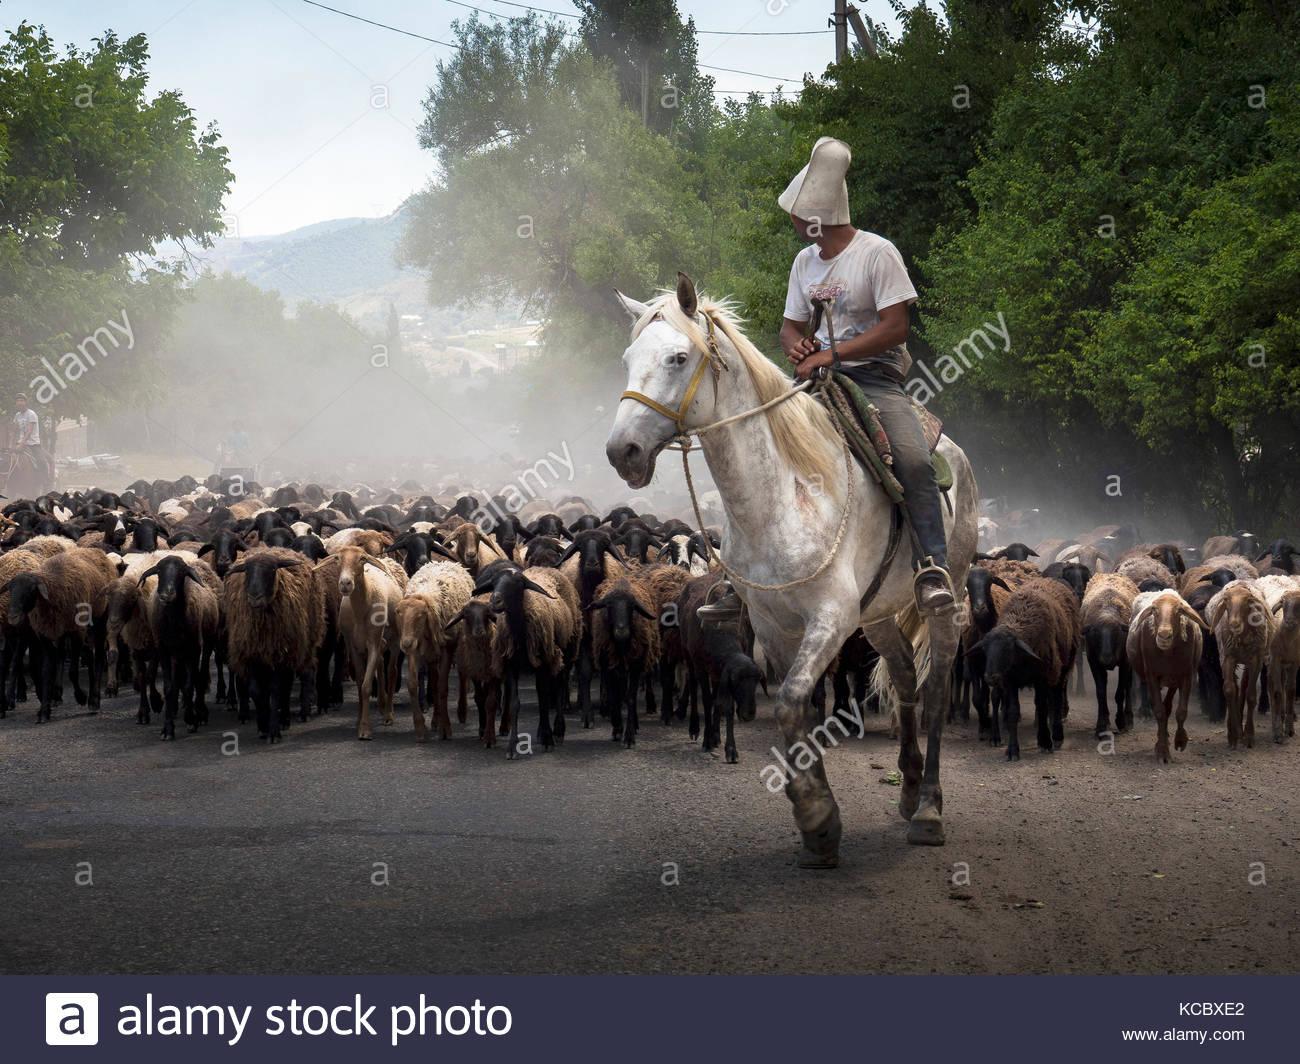 Rider and flocks of sheep, Arslanbob, Kyrgyzstan - Stock Image